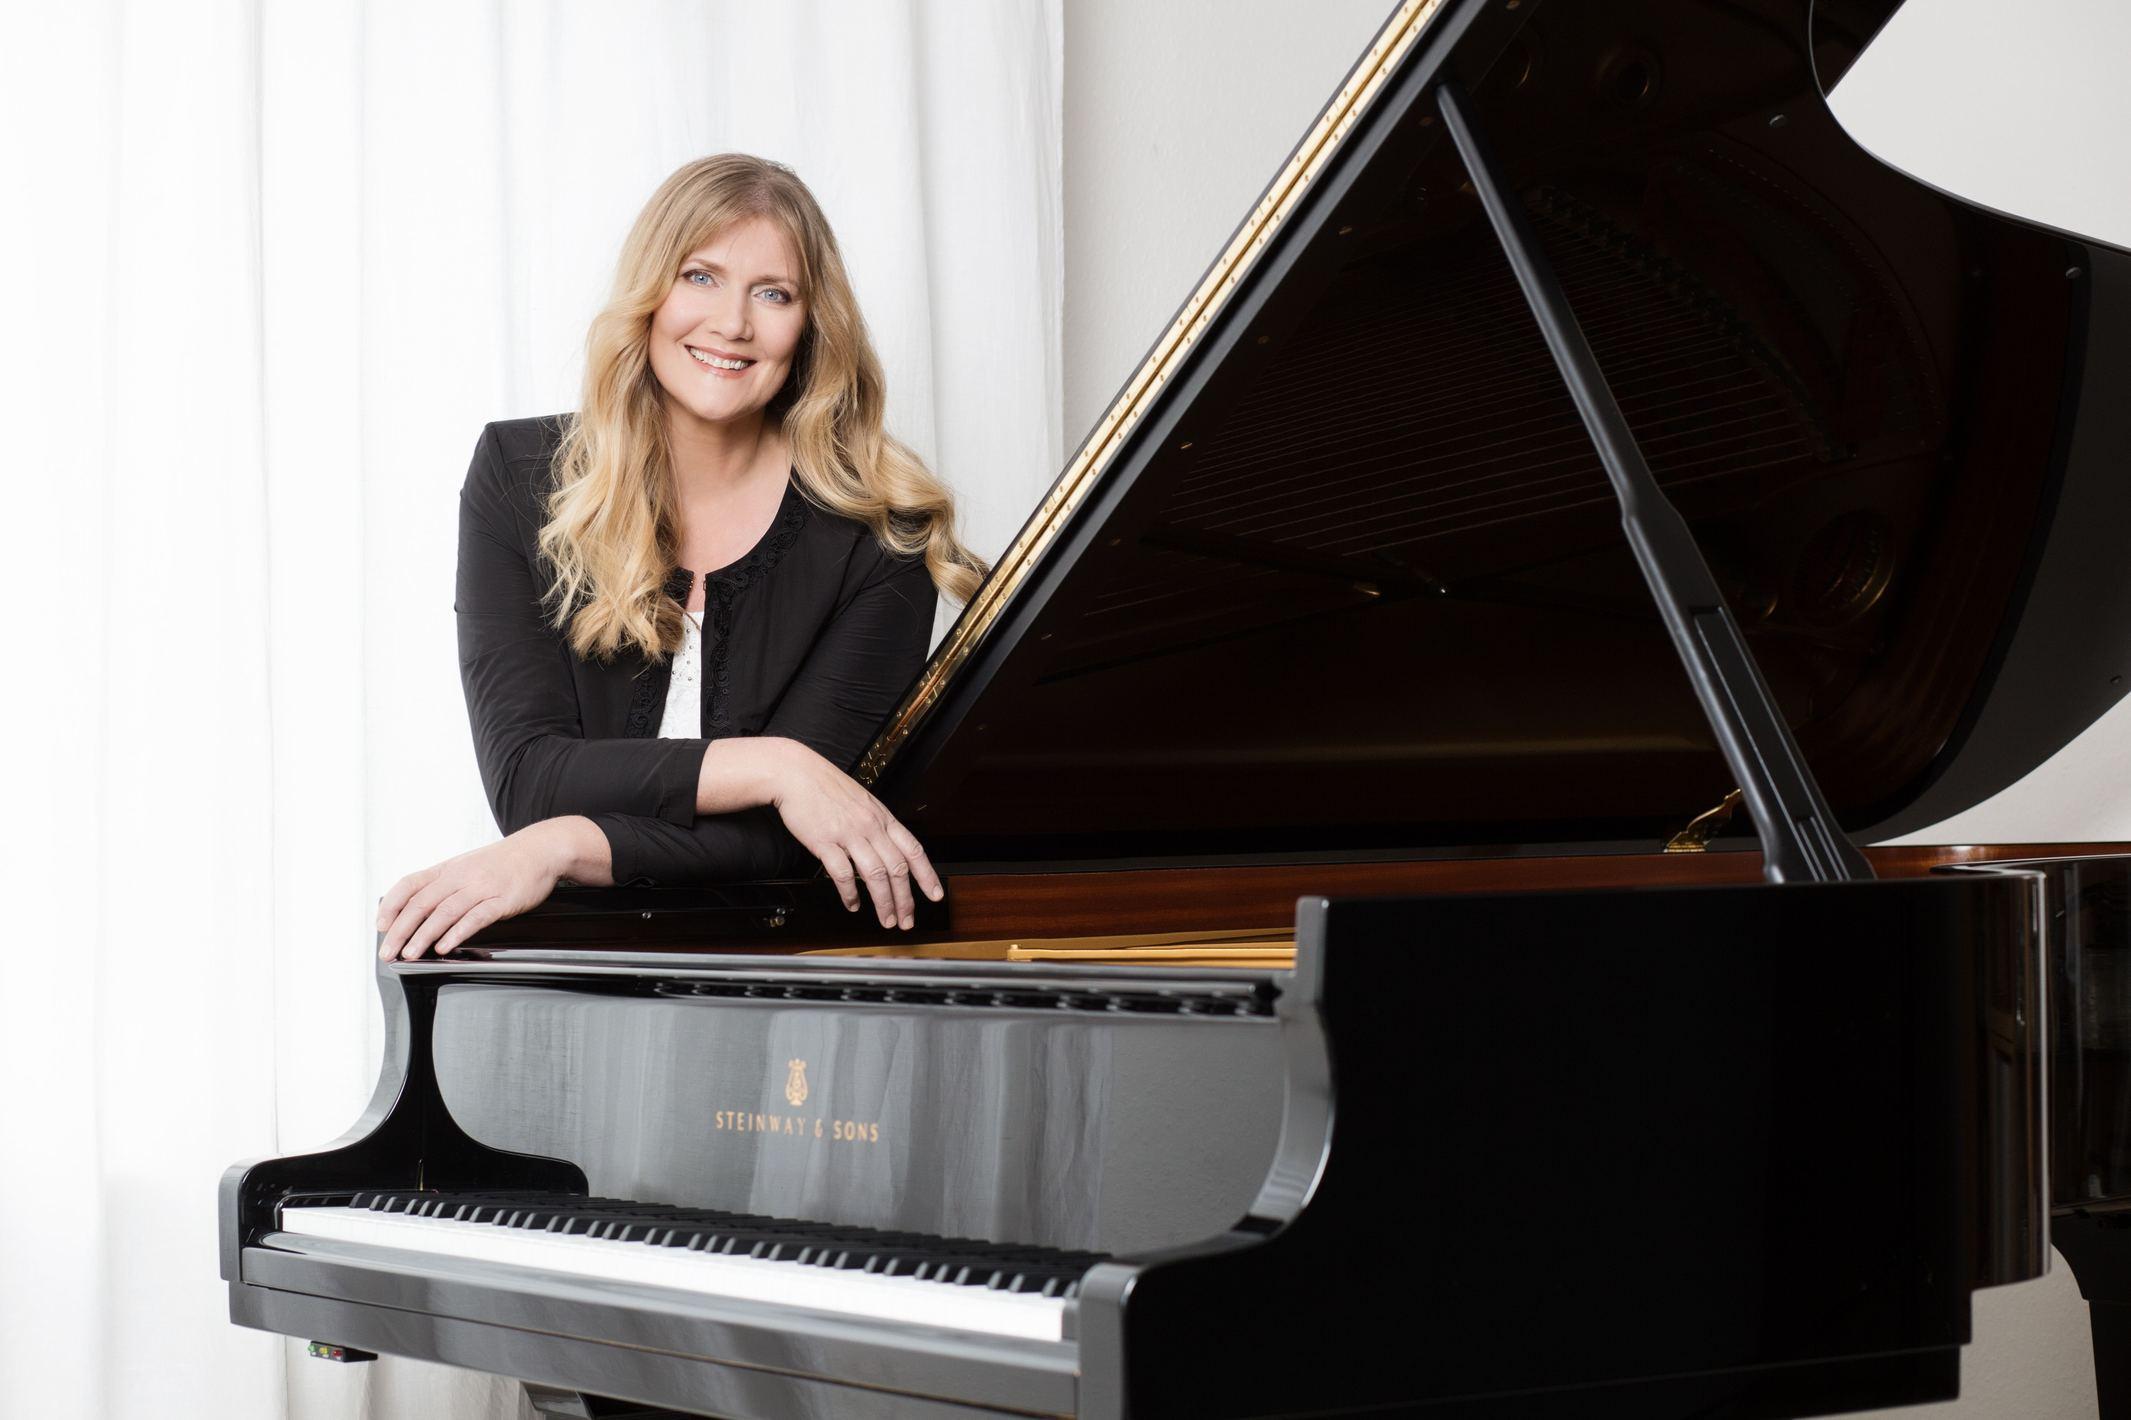 Klavier, Klavierunterricht Bad Soden, Pianistin Ulrike Danne-Feldmann, diplomierte Klavierpädagogin, Solo Klavier, Kammermusik